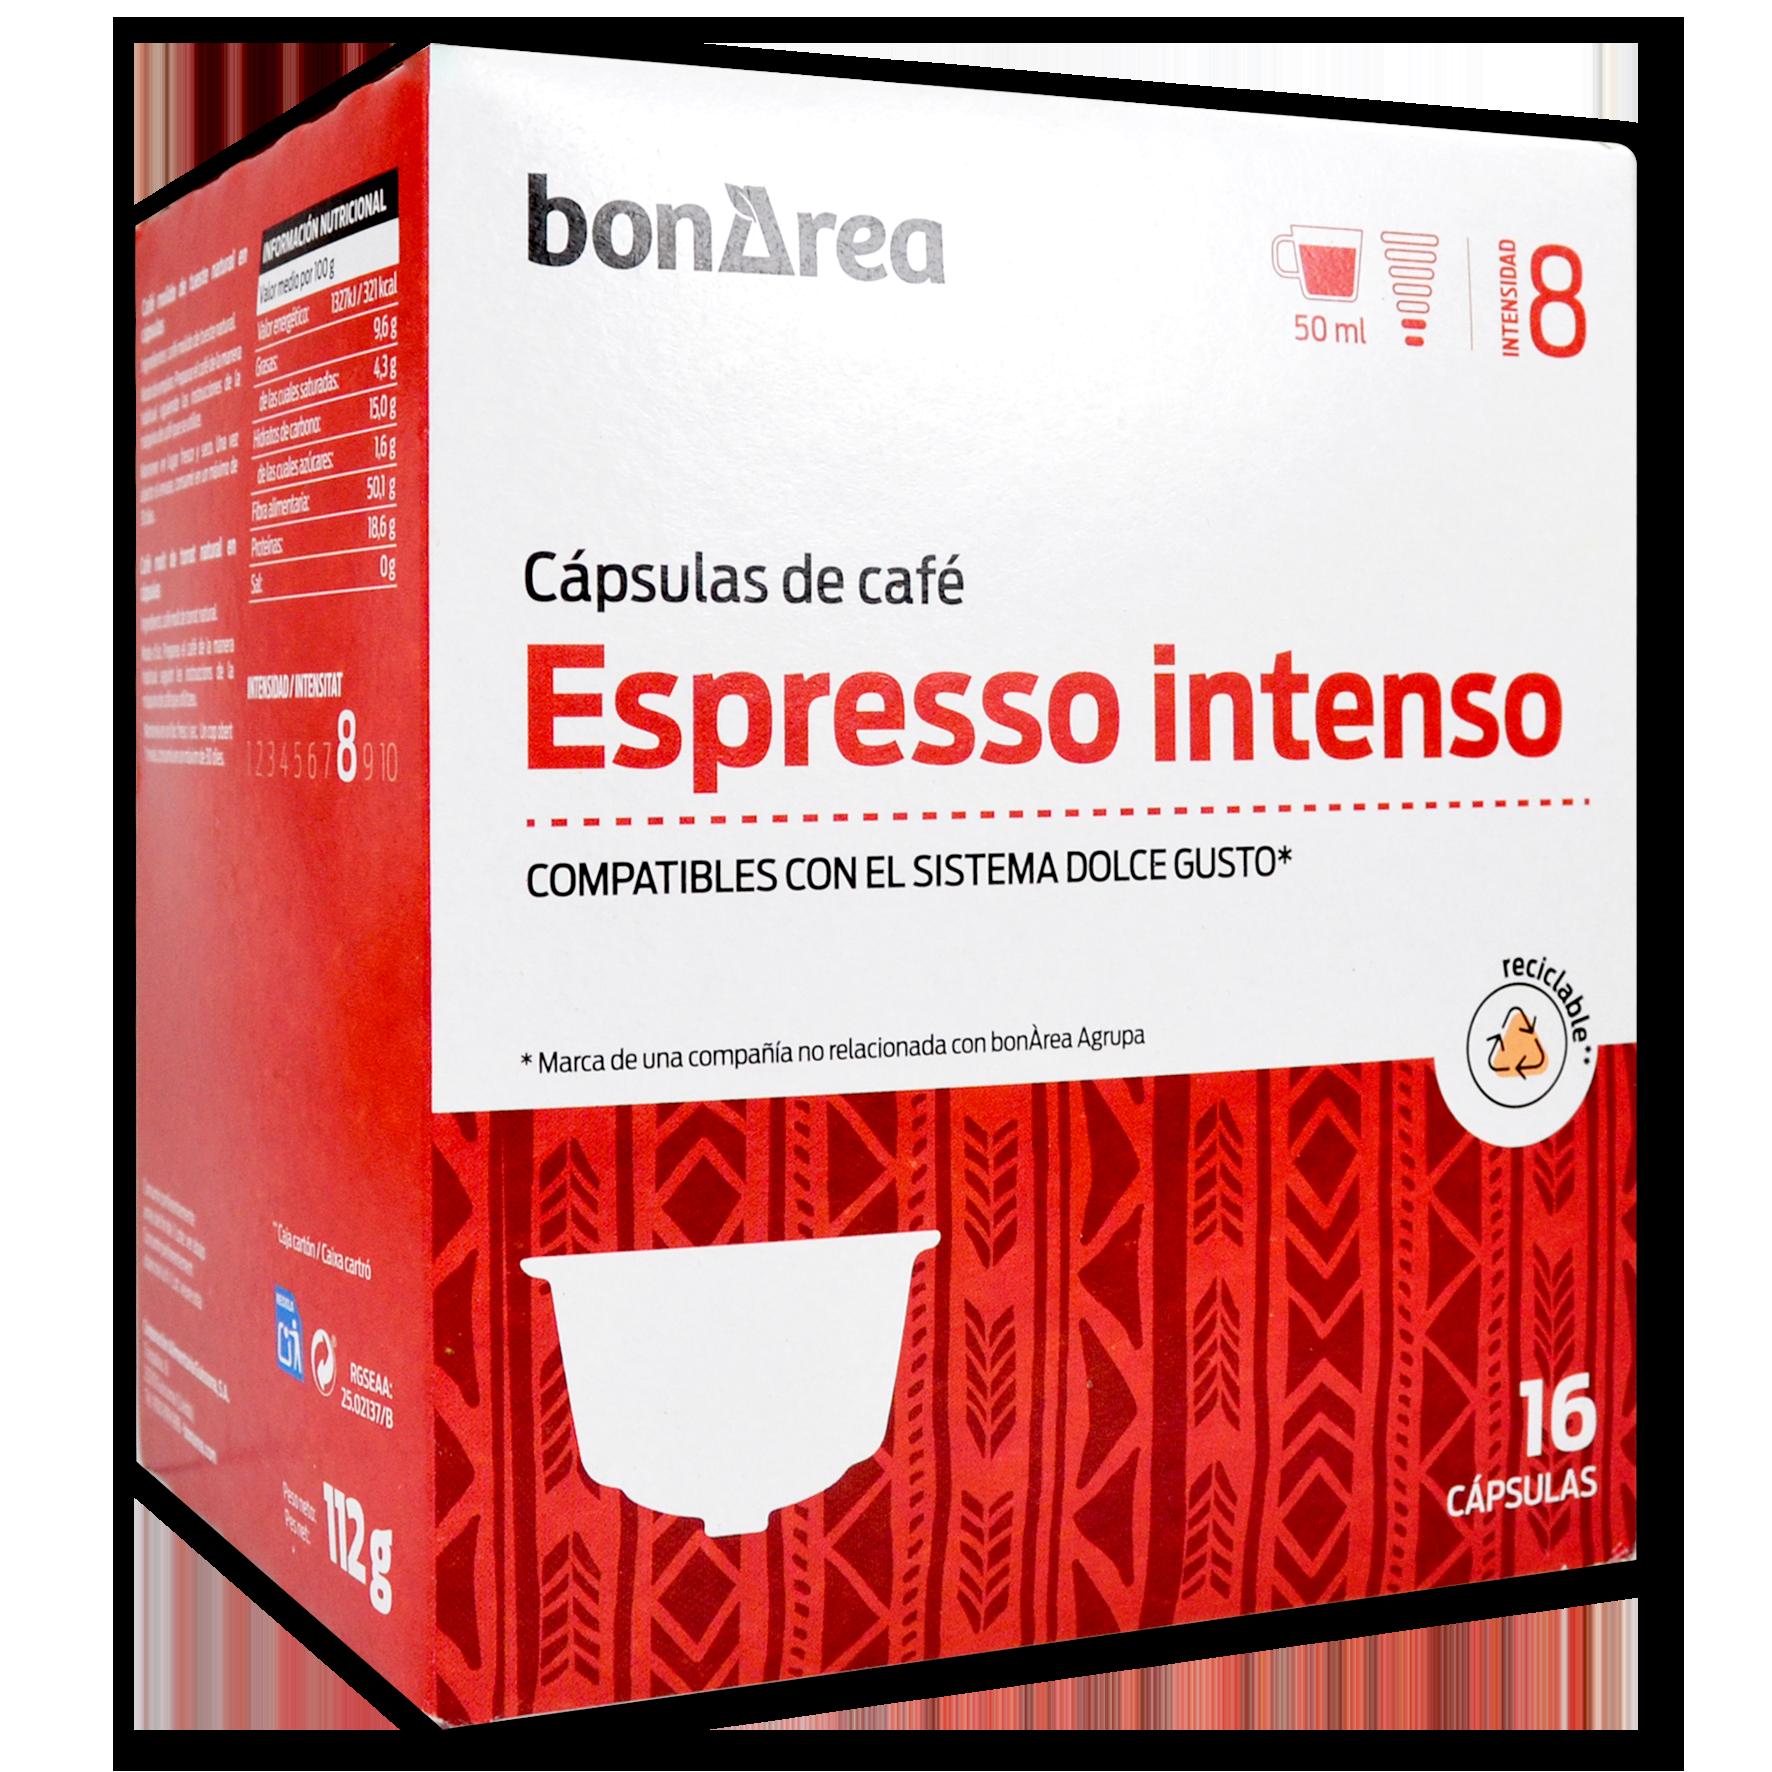 Càpsula de cafè espresso intens molt